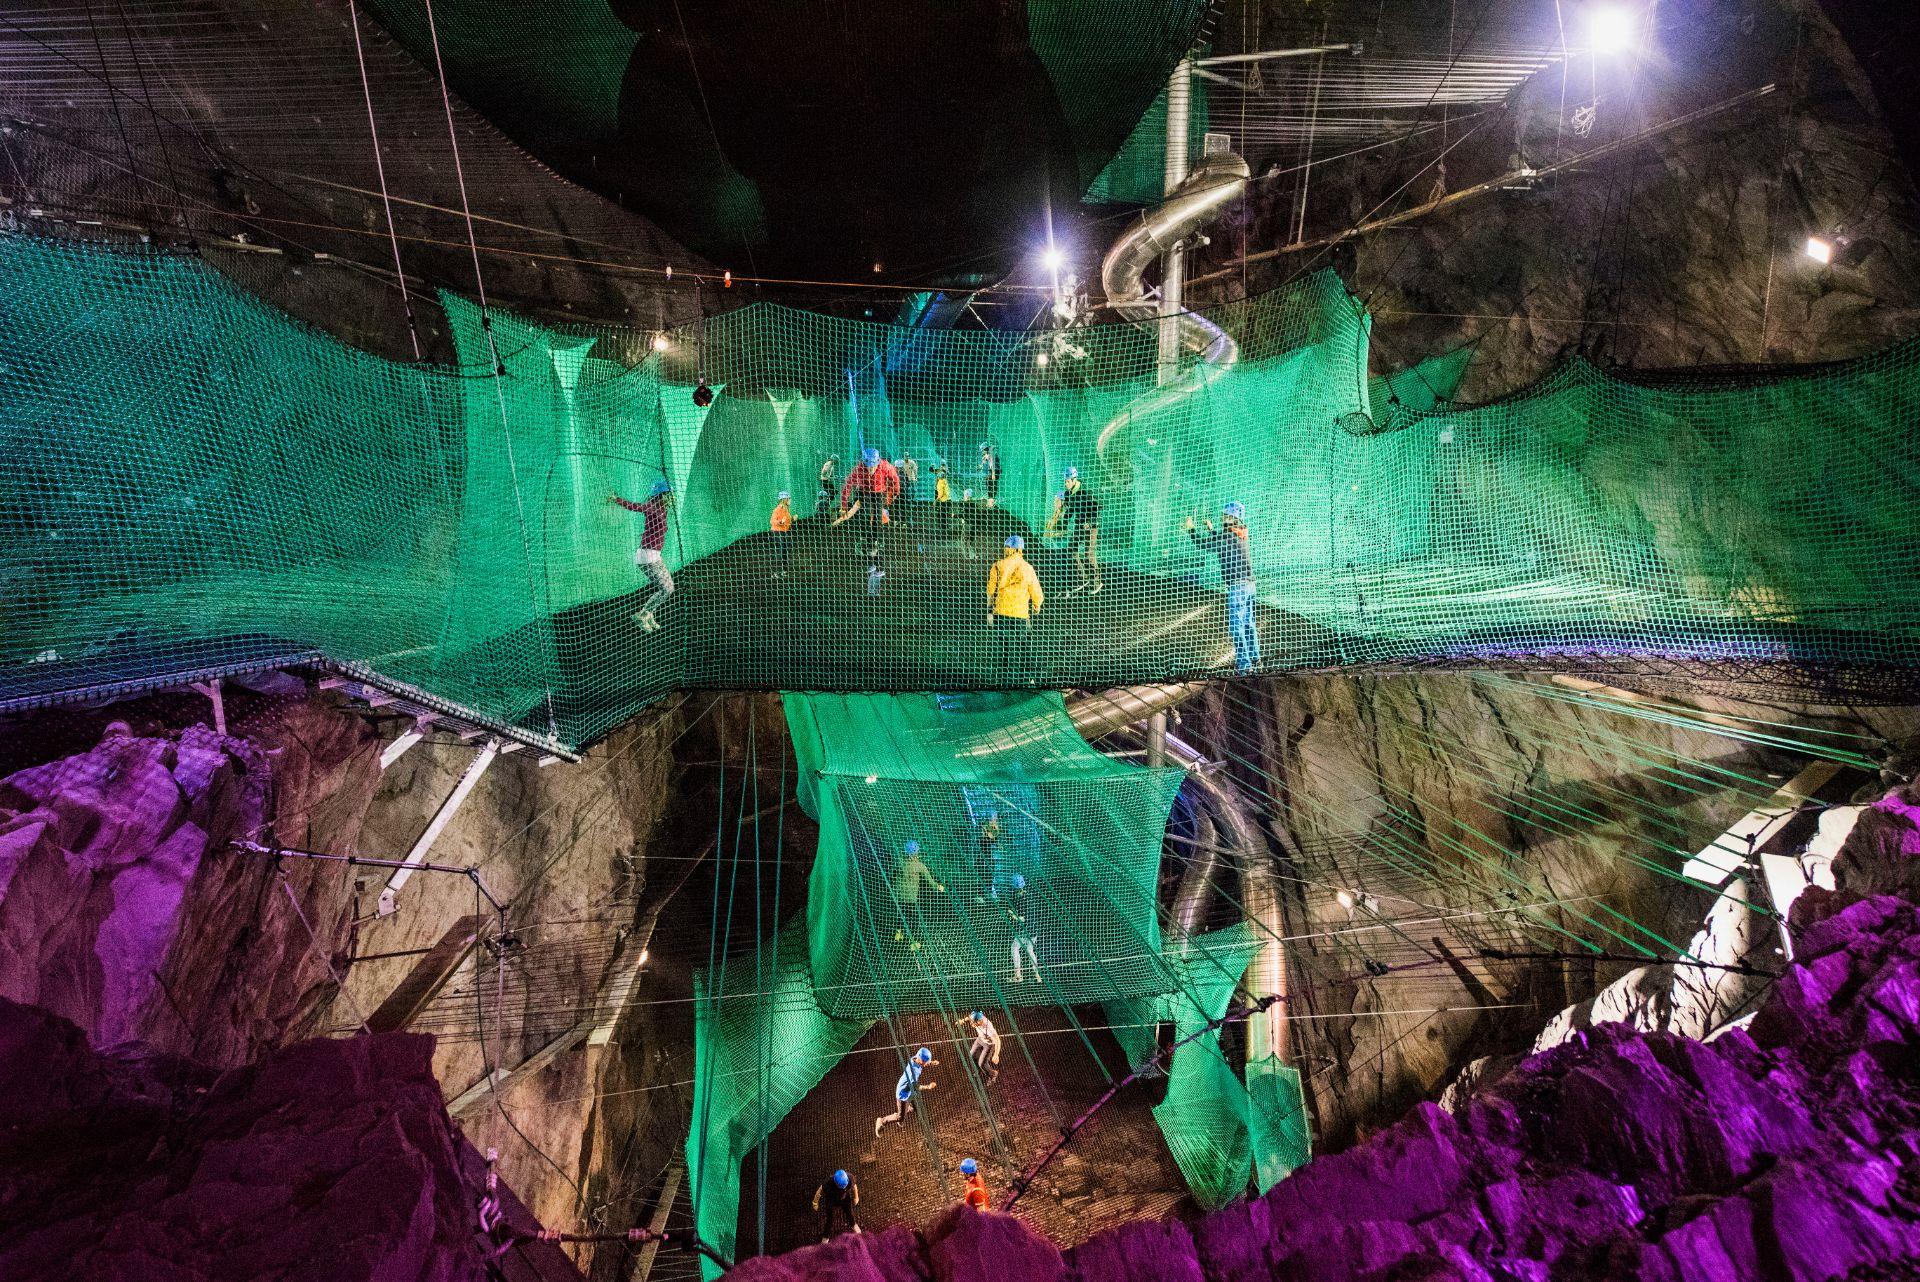 people-bouncing-on-netted-underground-trampolines-in-cavern-bounce-below-zip-world-snowdonia-outdoor-activities-wales